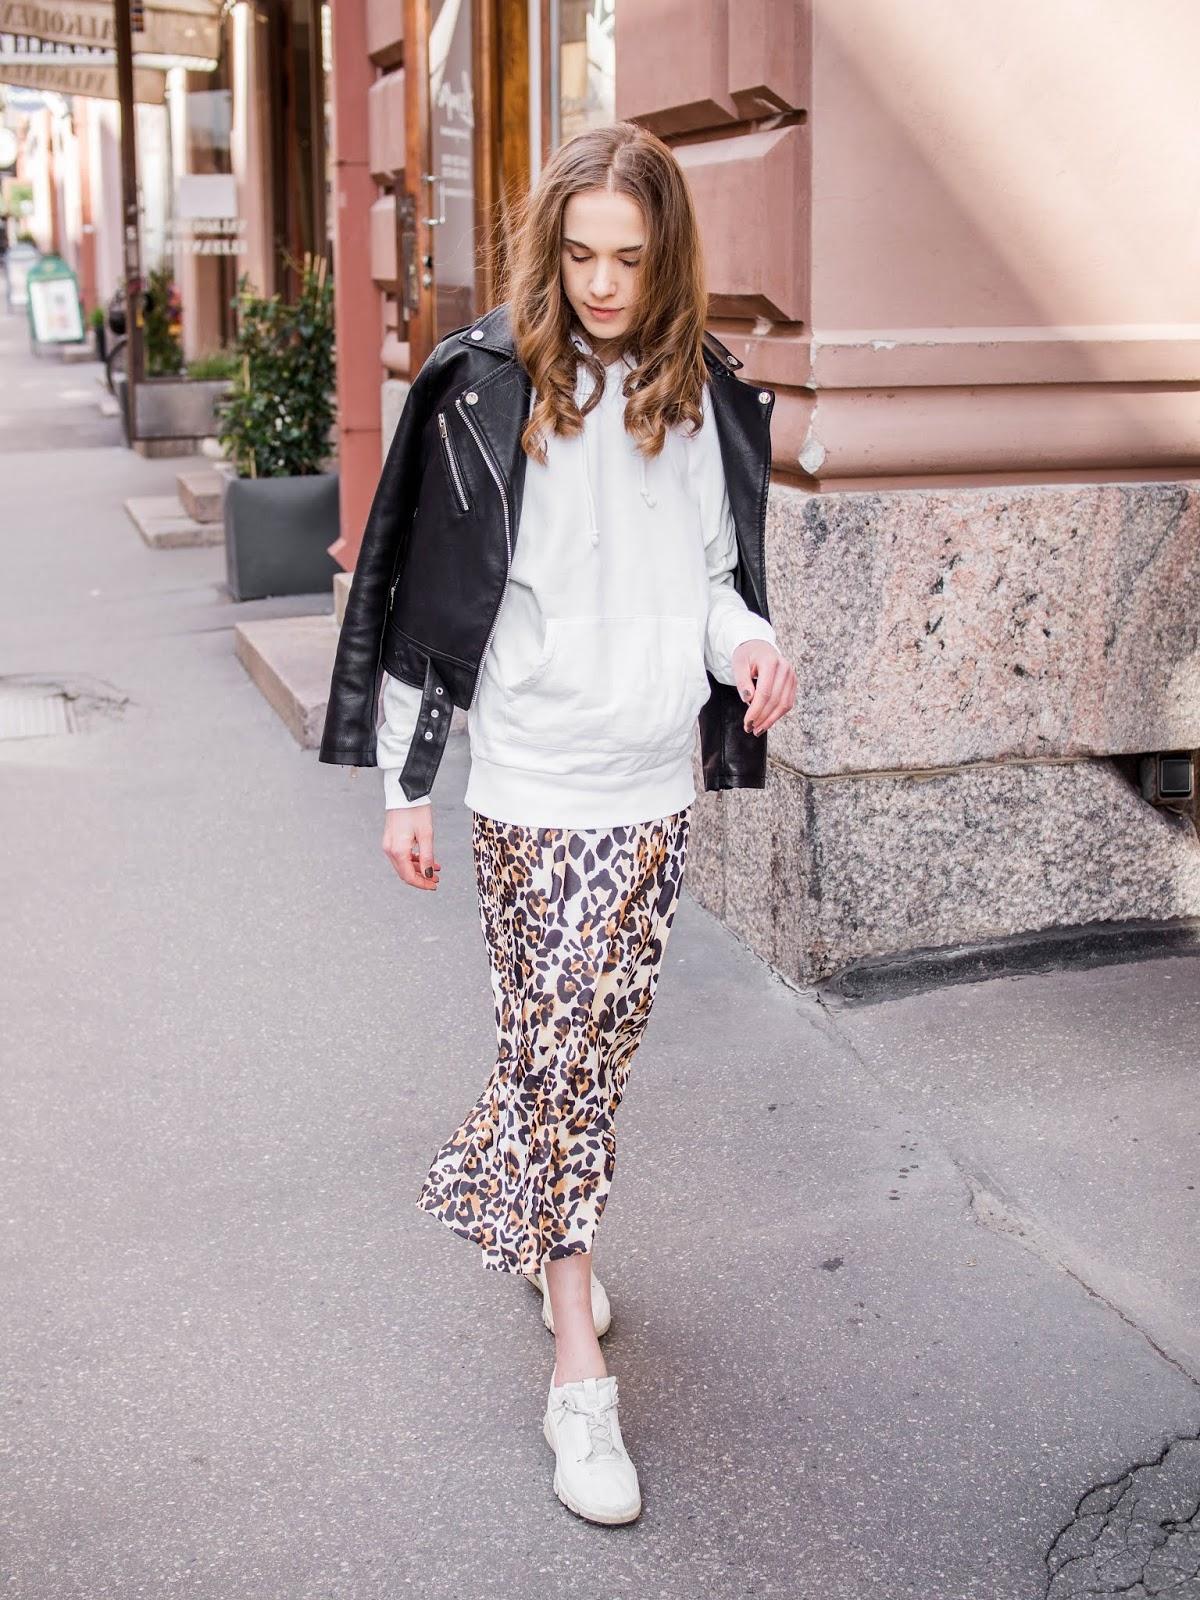 Leopard print bias cut satin midi skirt and white hoodie - Leopardikuvioitu satiininen midihame ja valkoinen huppari